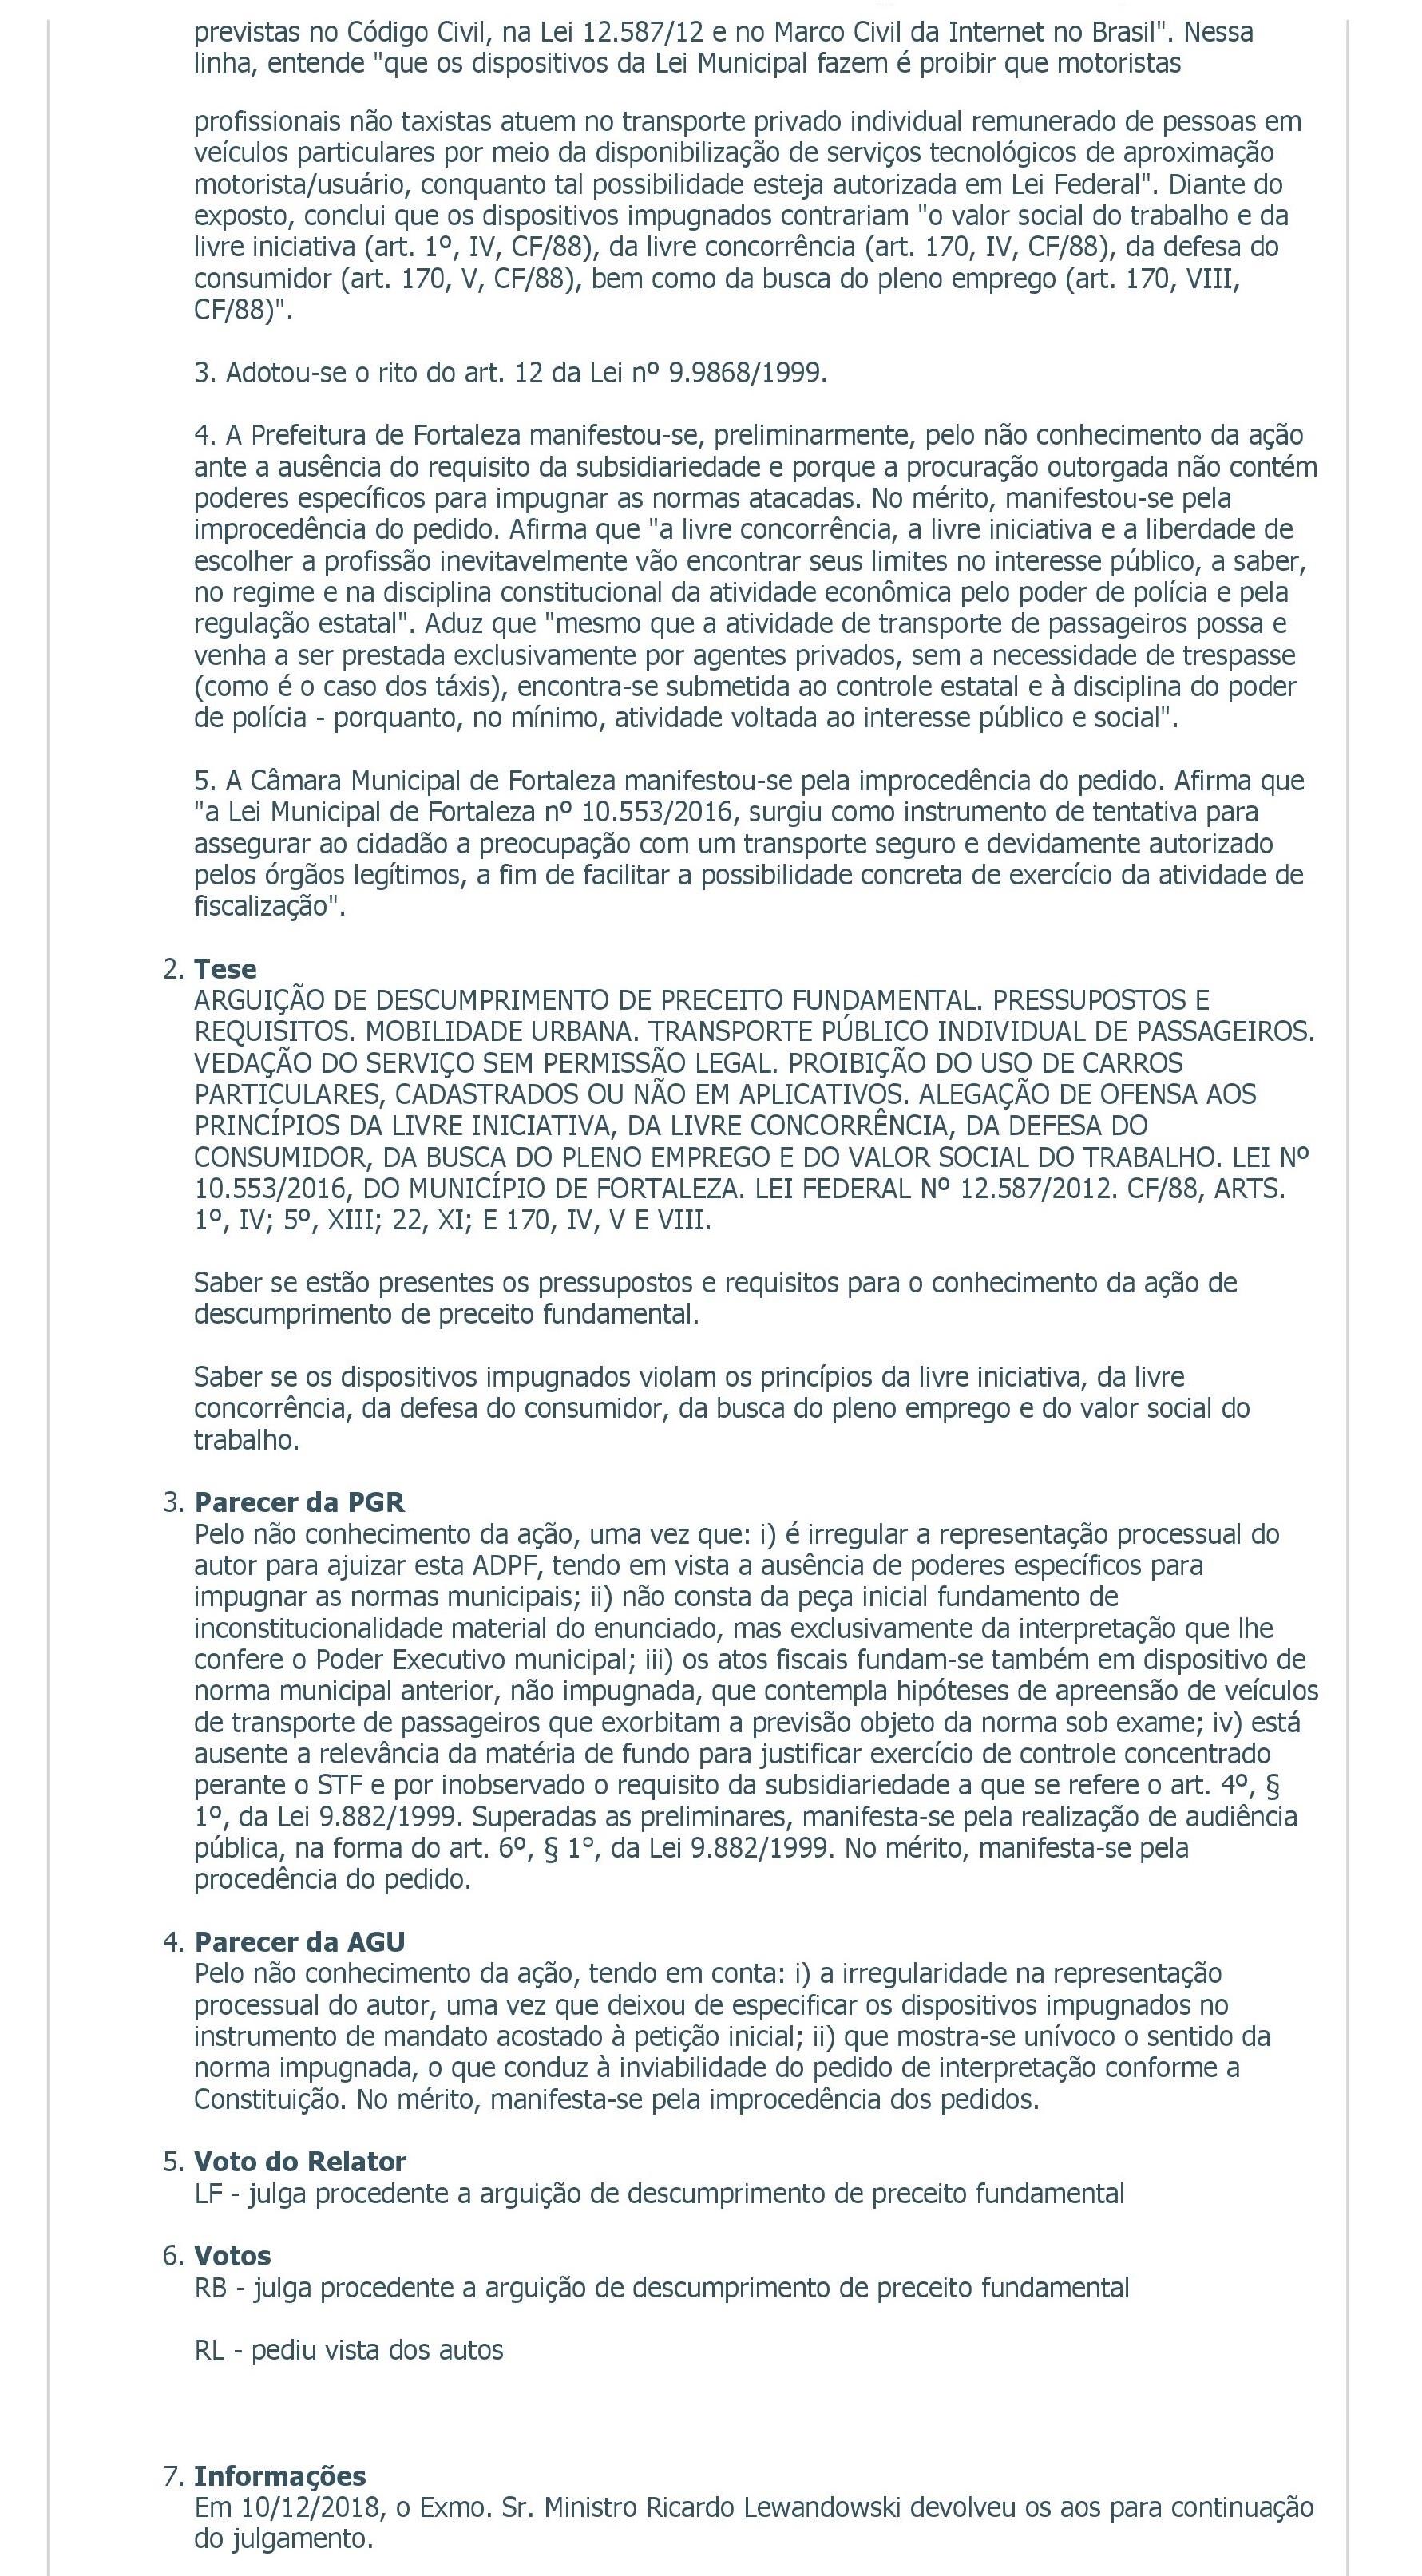 pauta_julgamento_STF_a_02